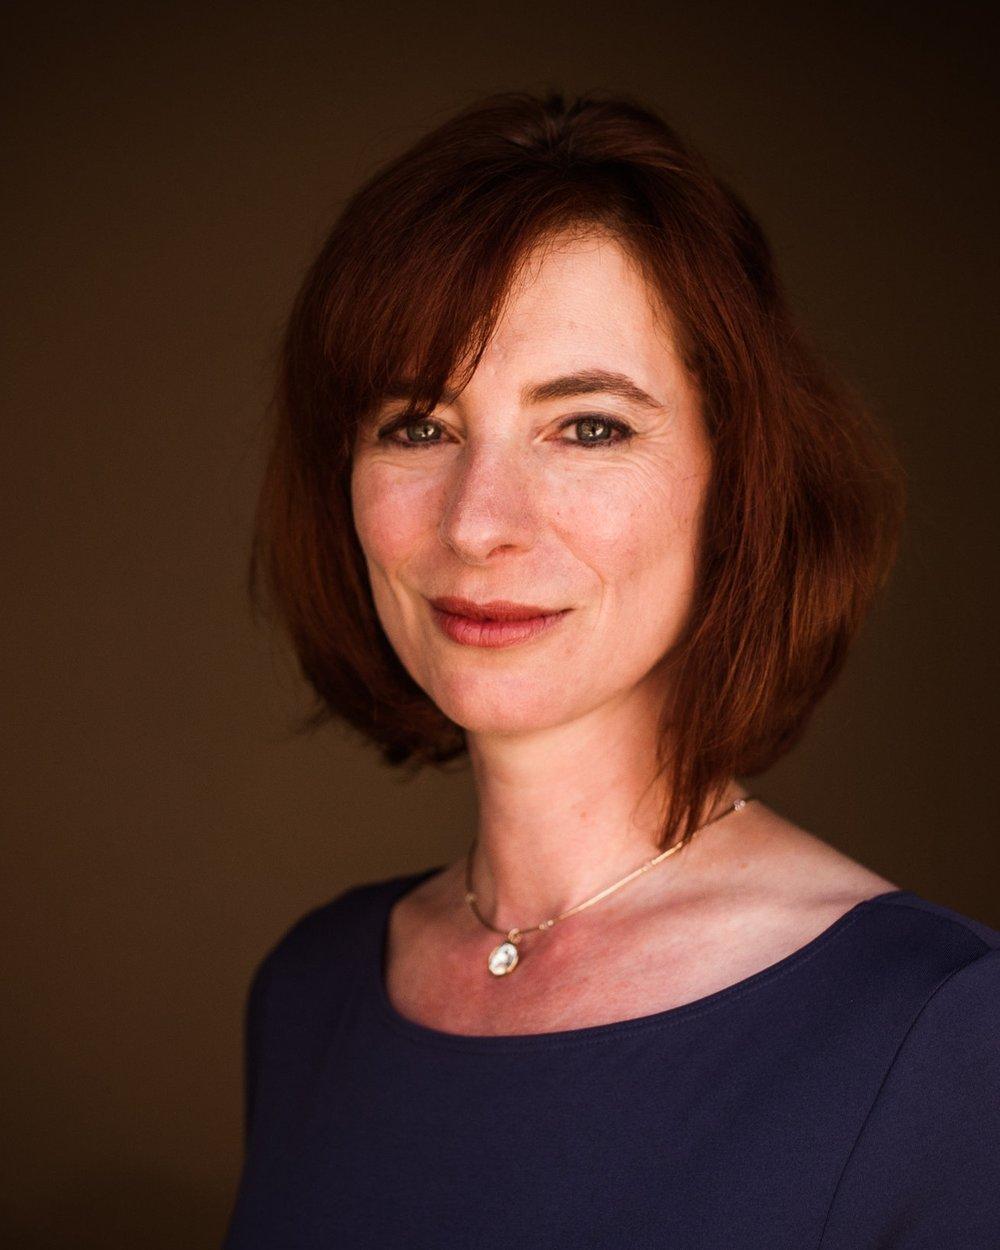 Joanna Pincus Headshot